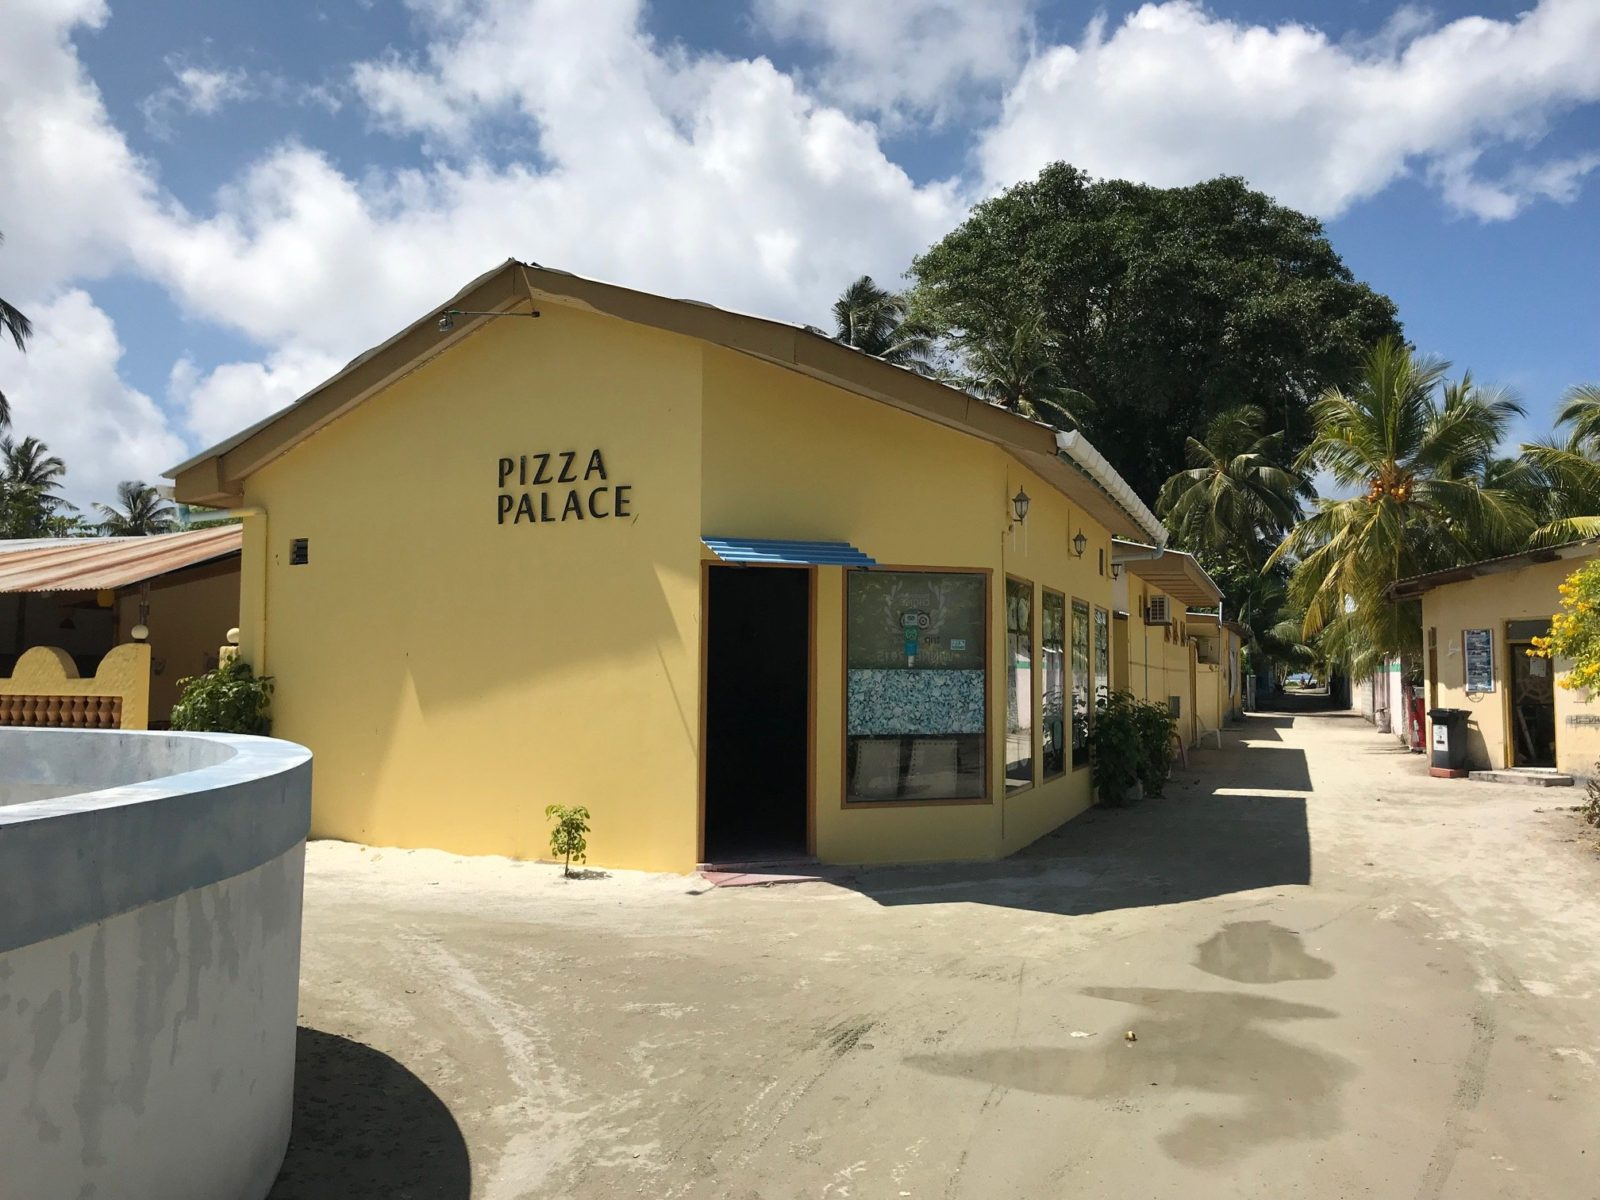 "кафе-пиццирия ""Pizza Palace"" на Мальдивах, остров Мативери"